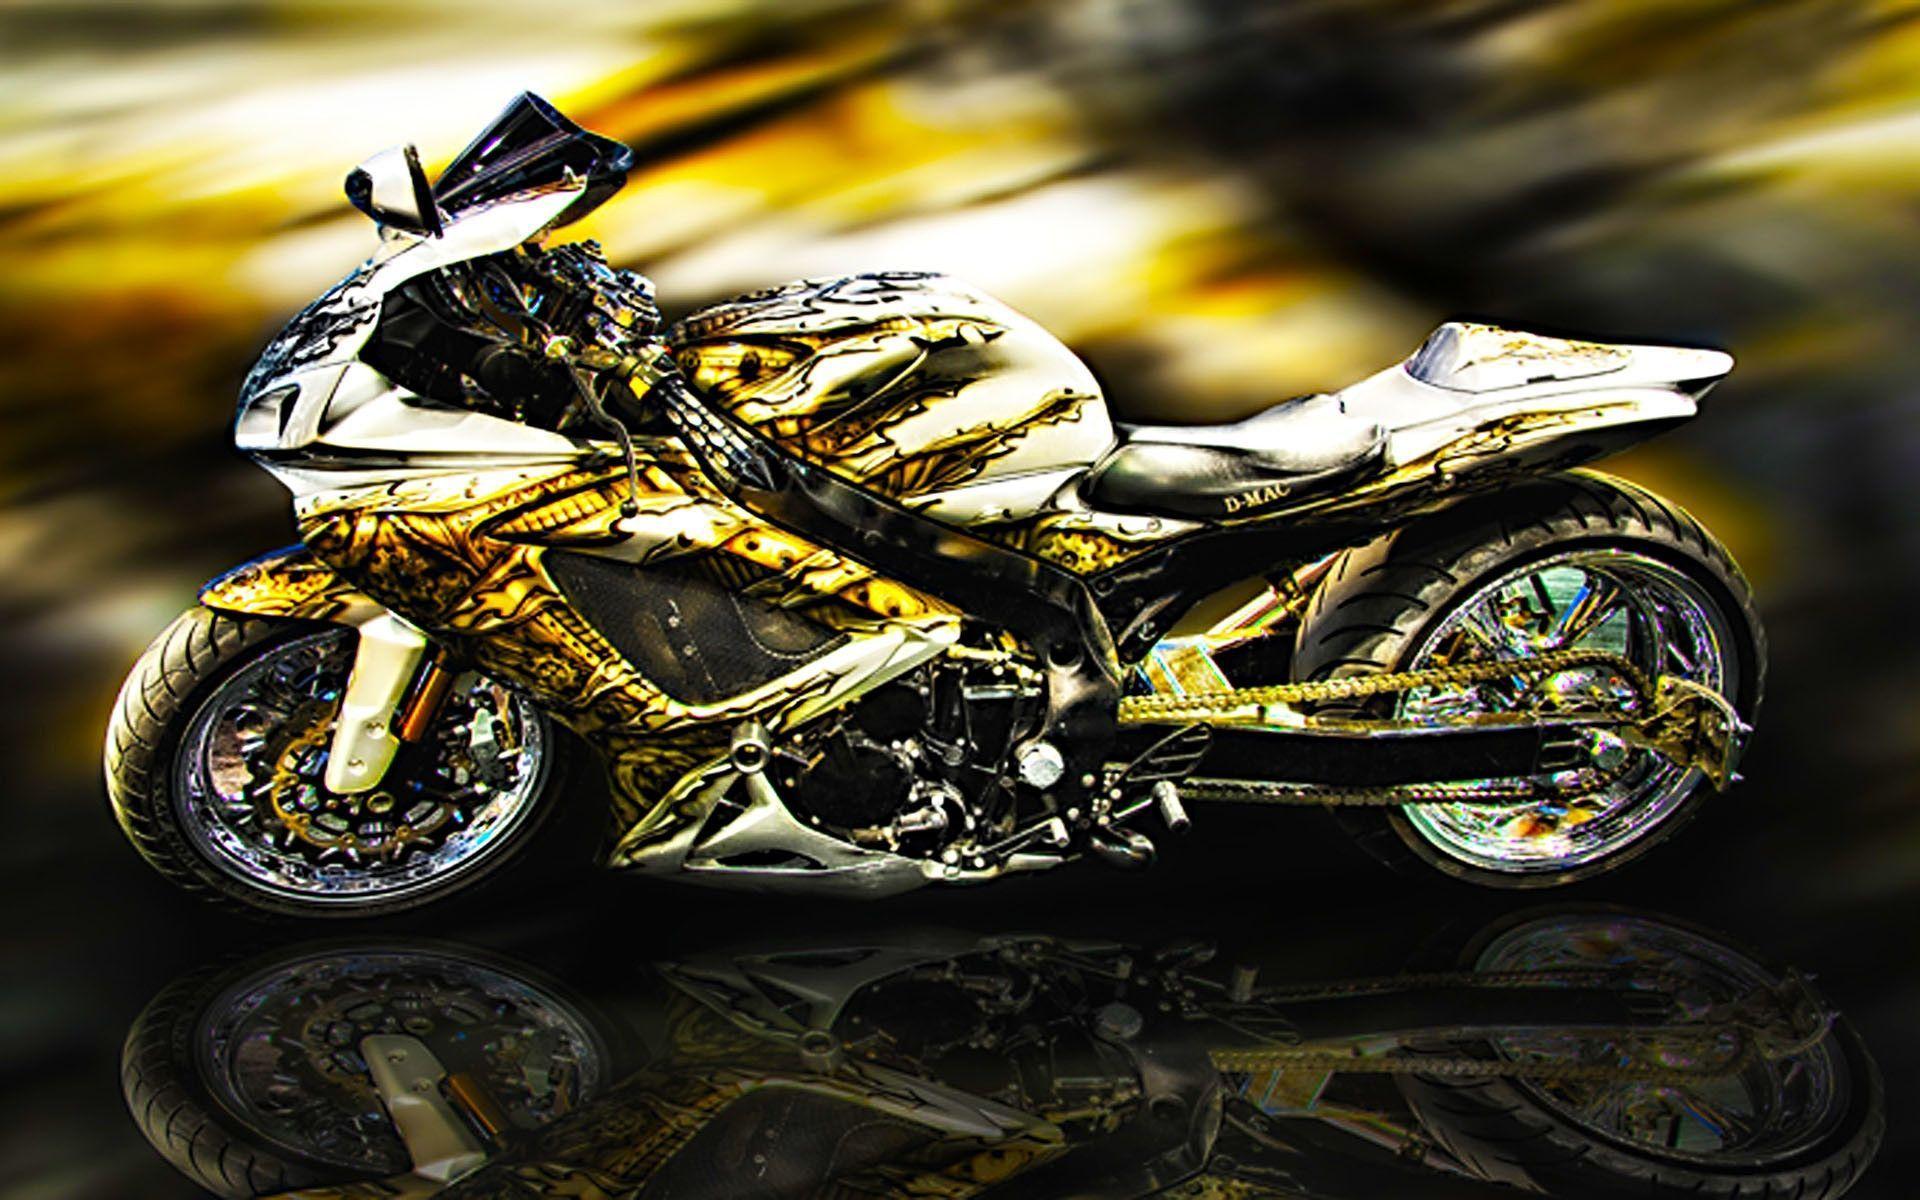 Cool Motorcycle Wallpapers Wallpaper Cave Con Imagenes Motos